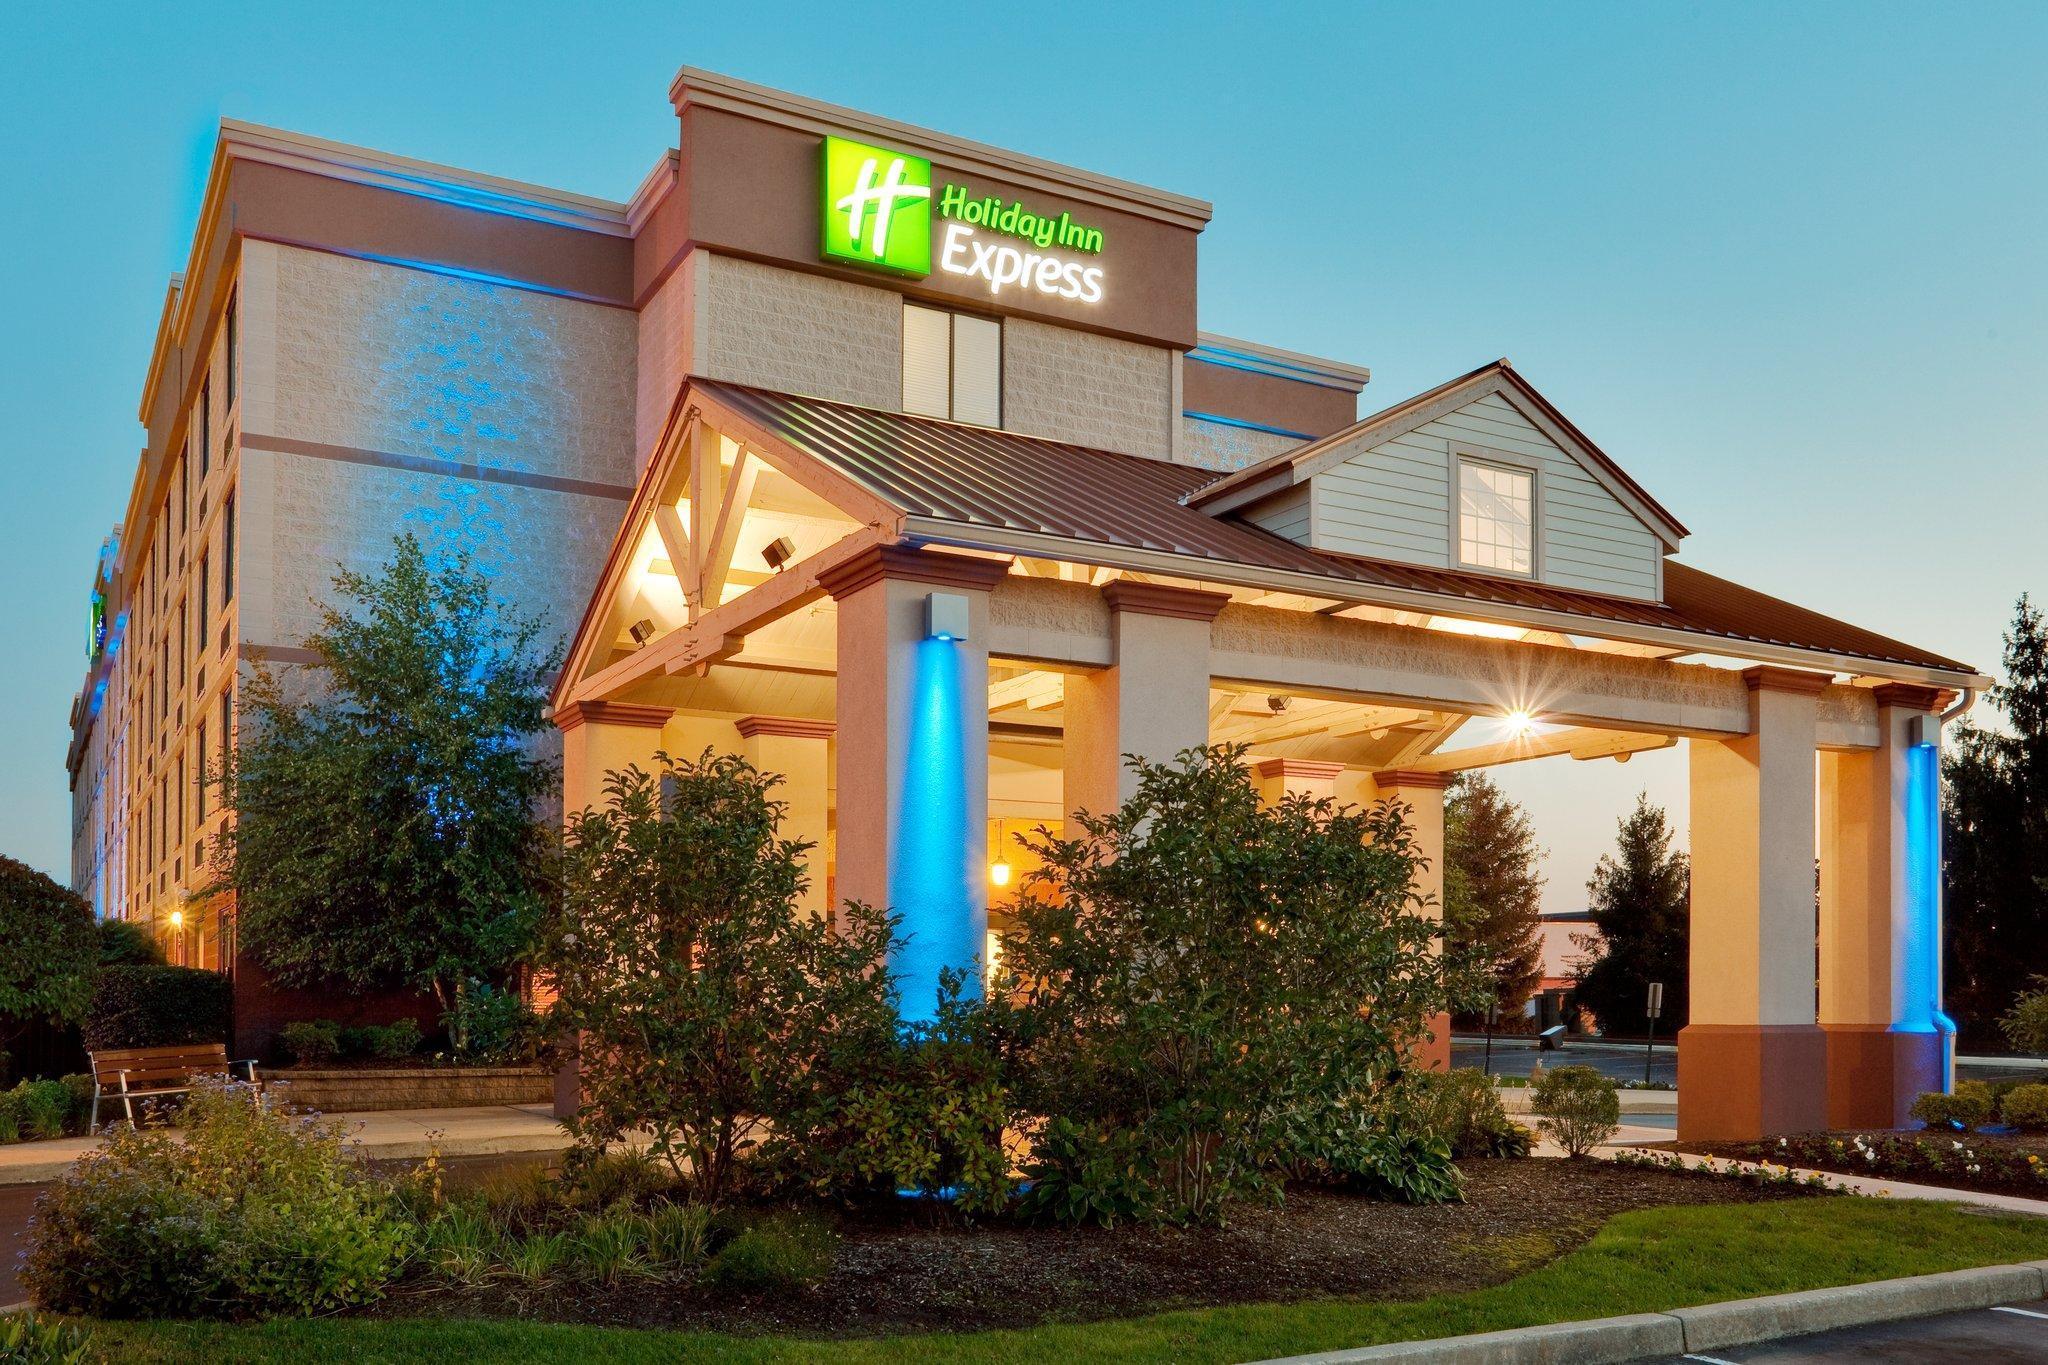 Holiday Inn Express Exton Lionville